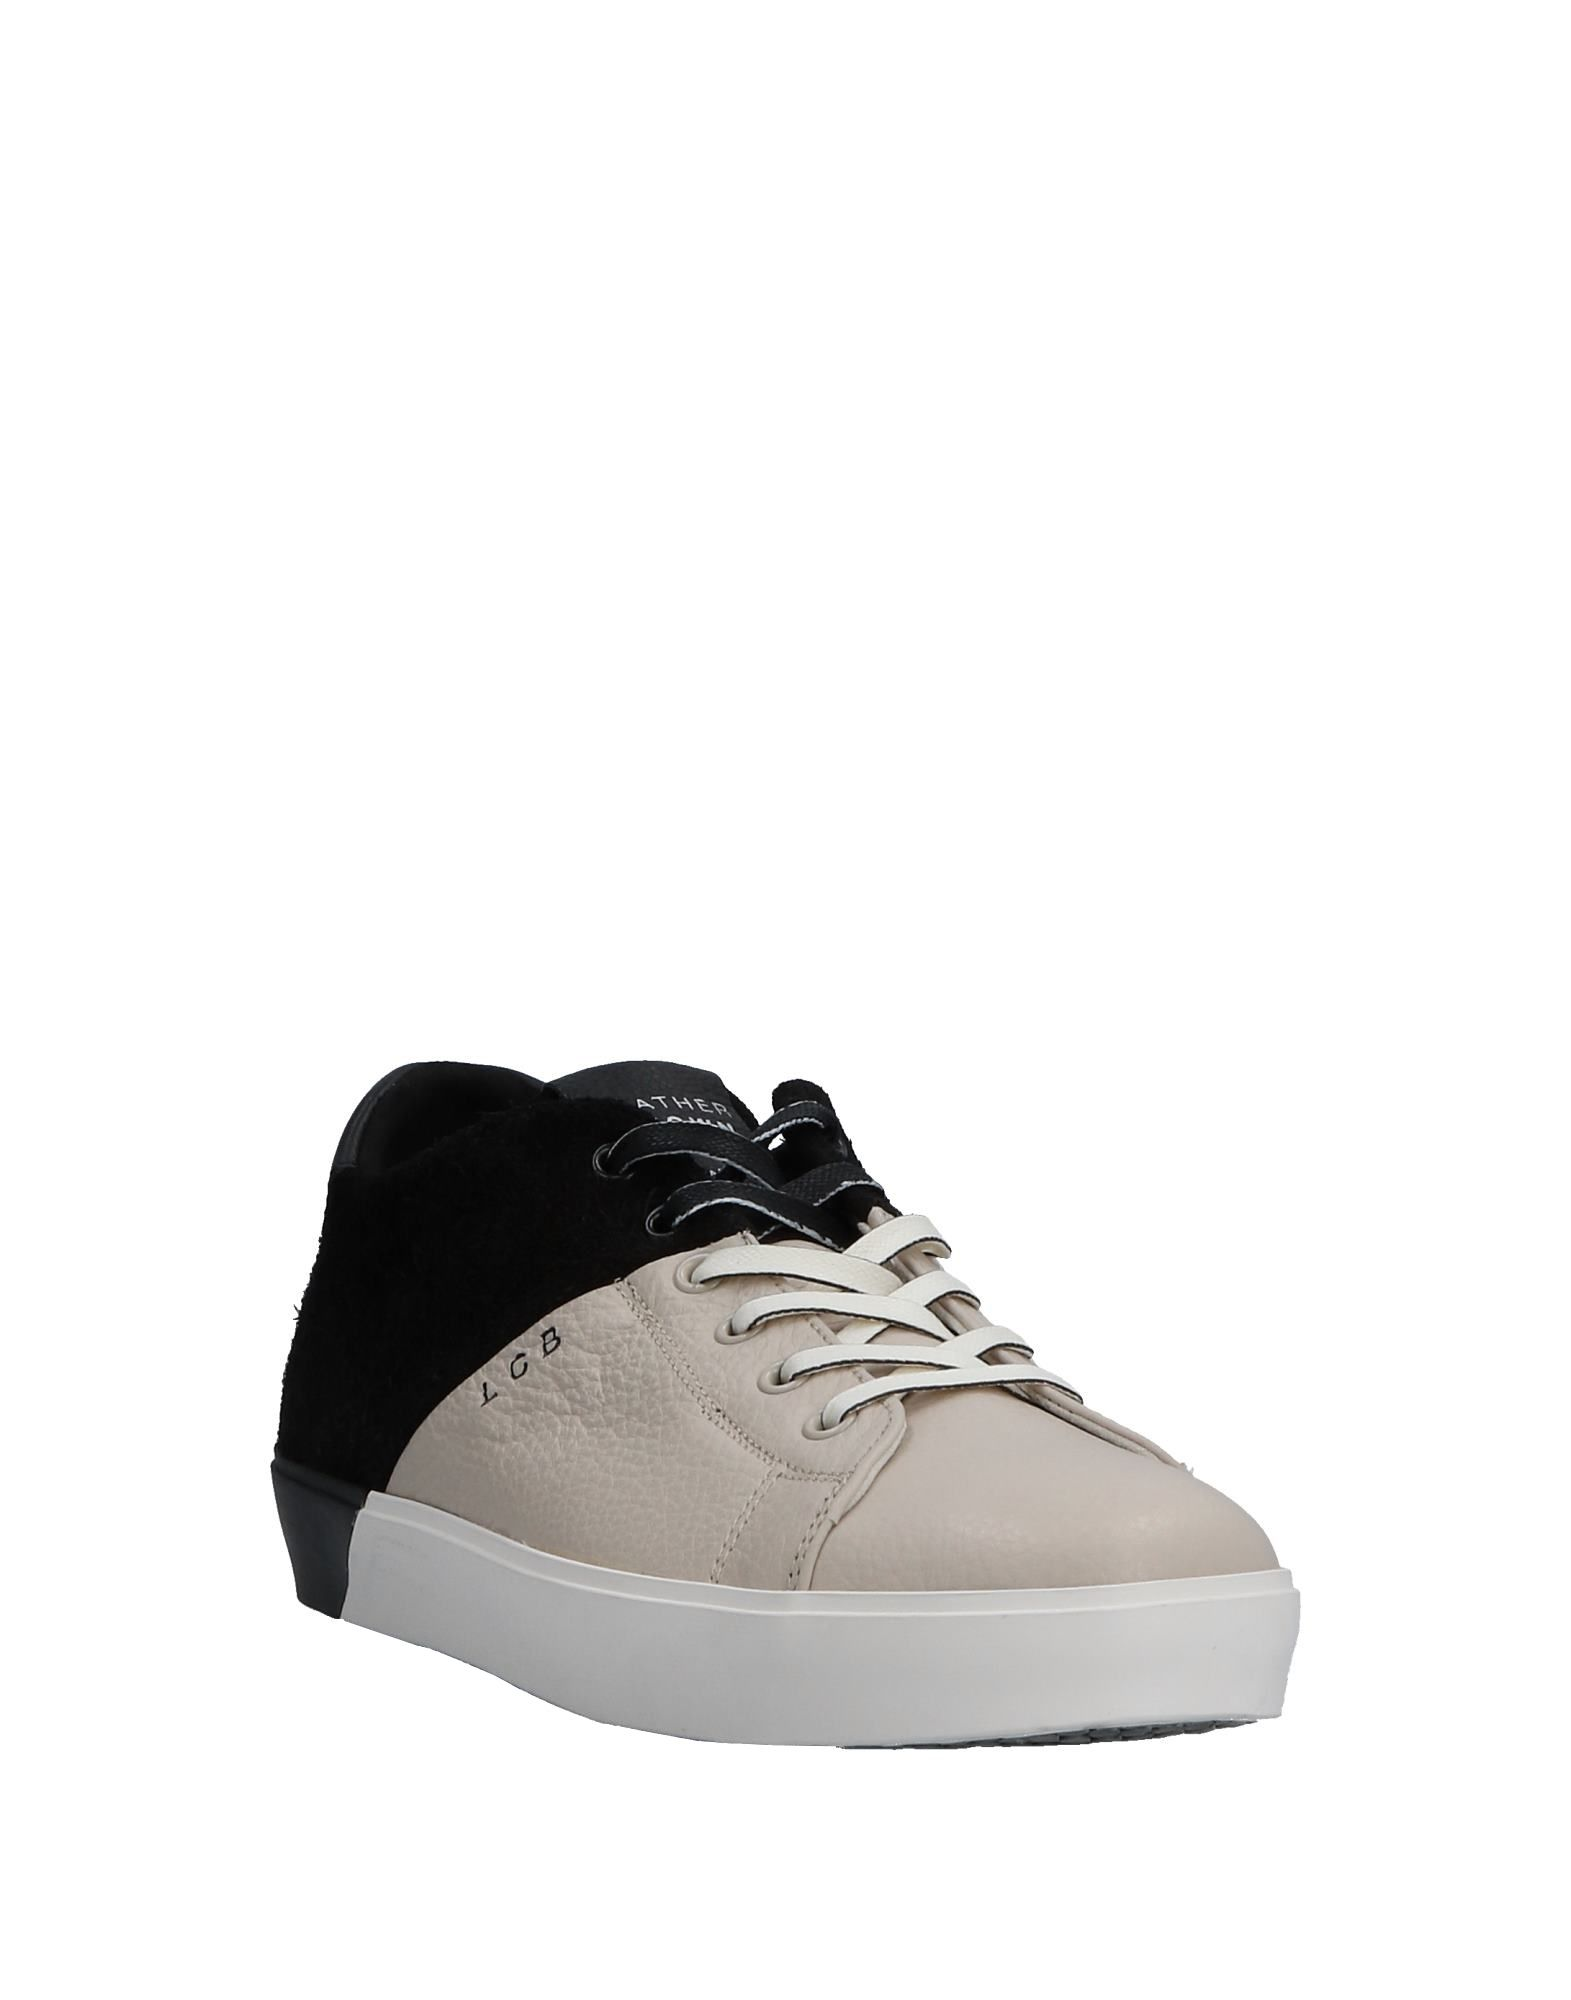 Leather Crown Sneakers Herren  Schuhe 11531740QL Gute Qualität beliebte Schuhe  dea3b4